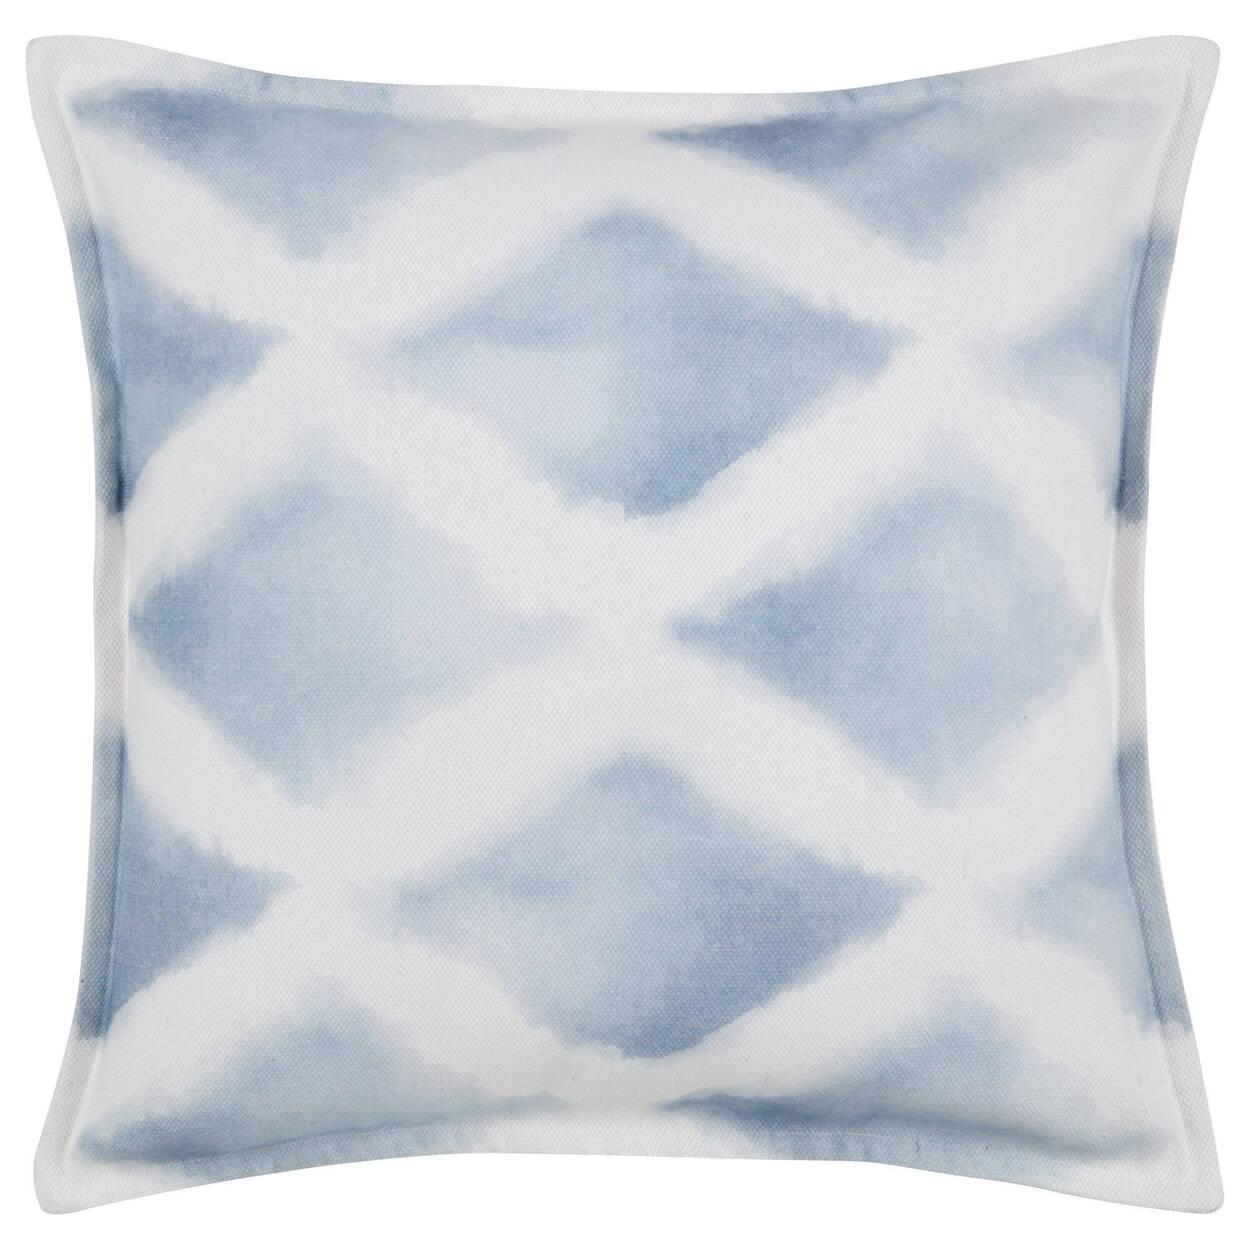 "Coussin décoratif tie-dye Alina 20"" x 20"""